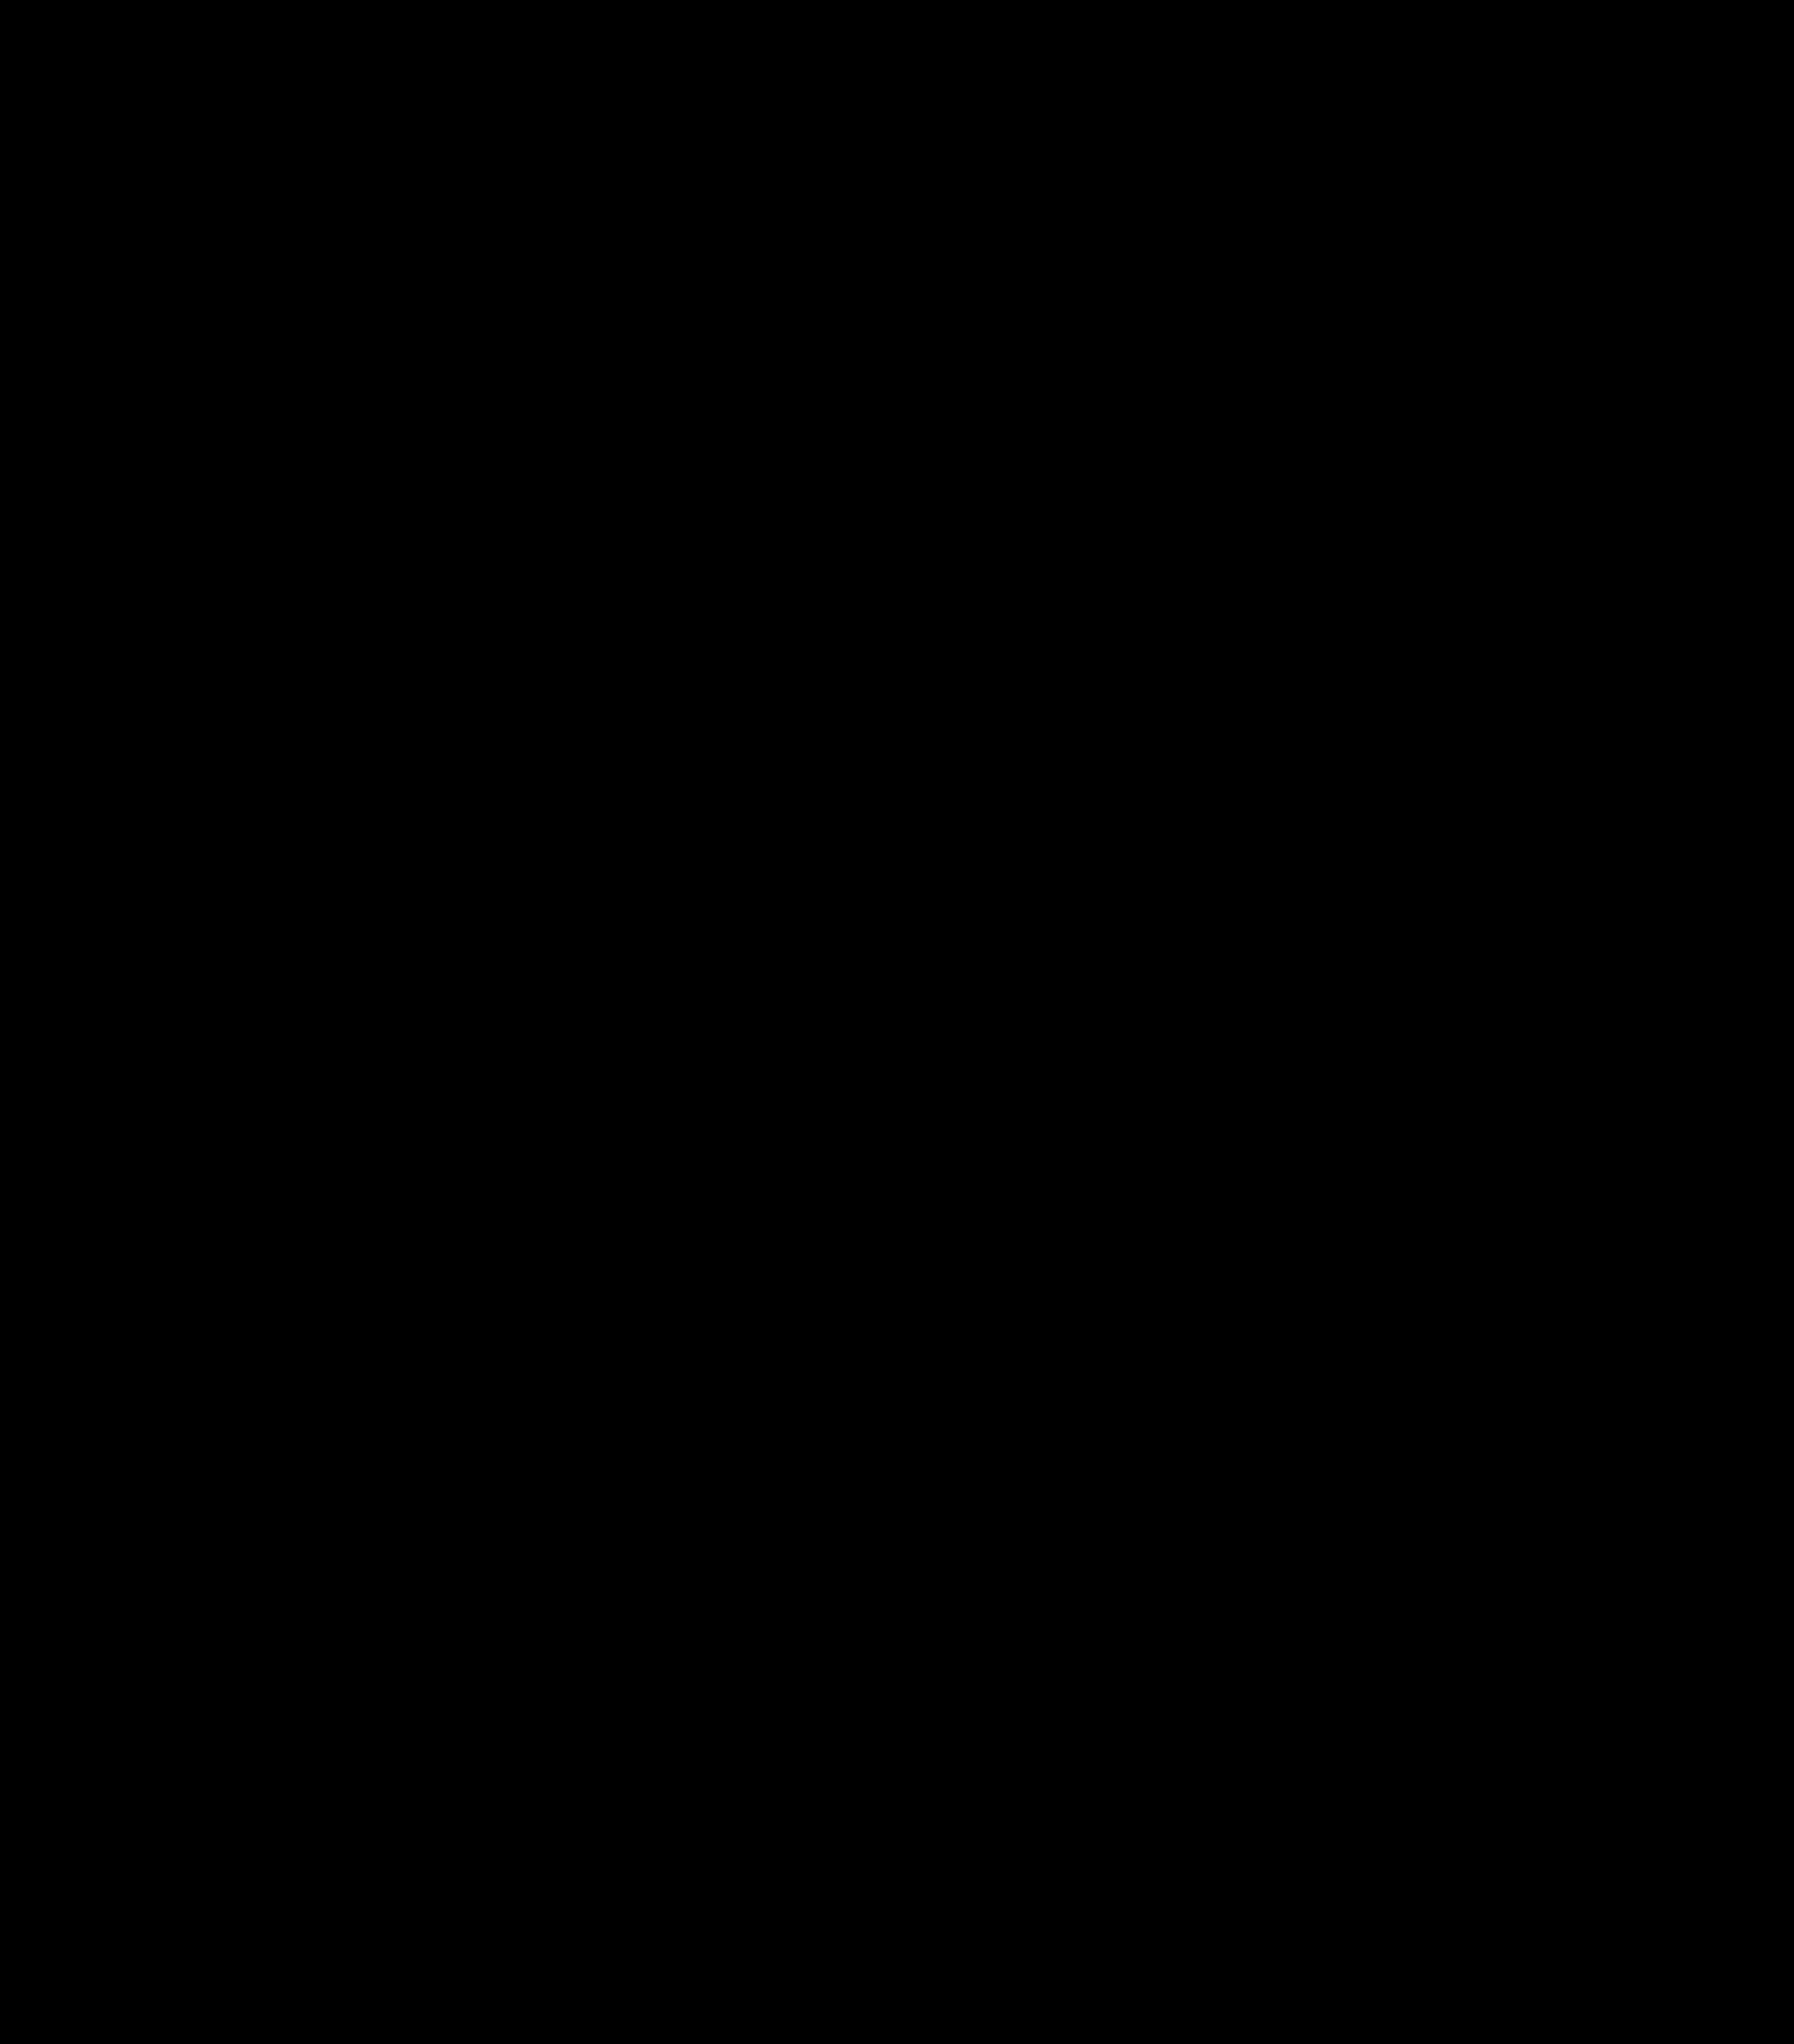 2107x2400 Clipart